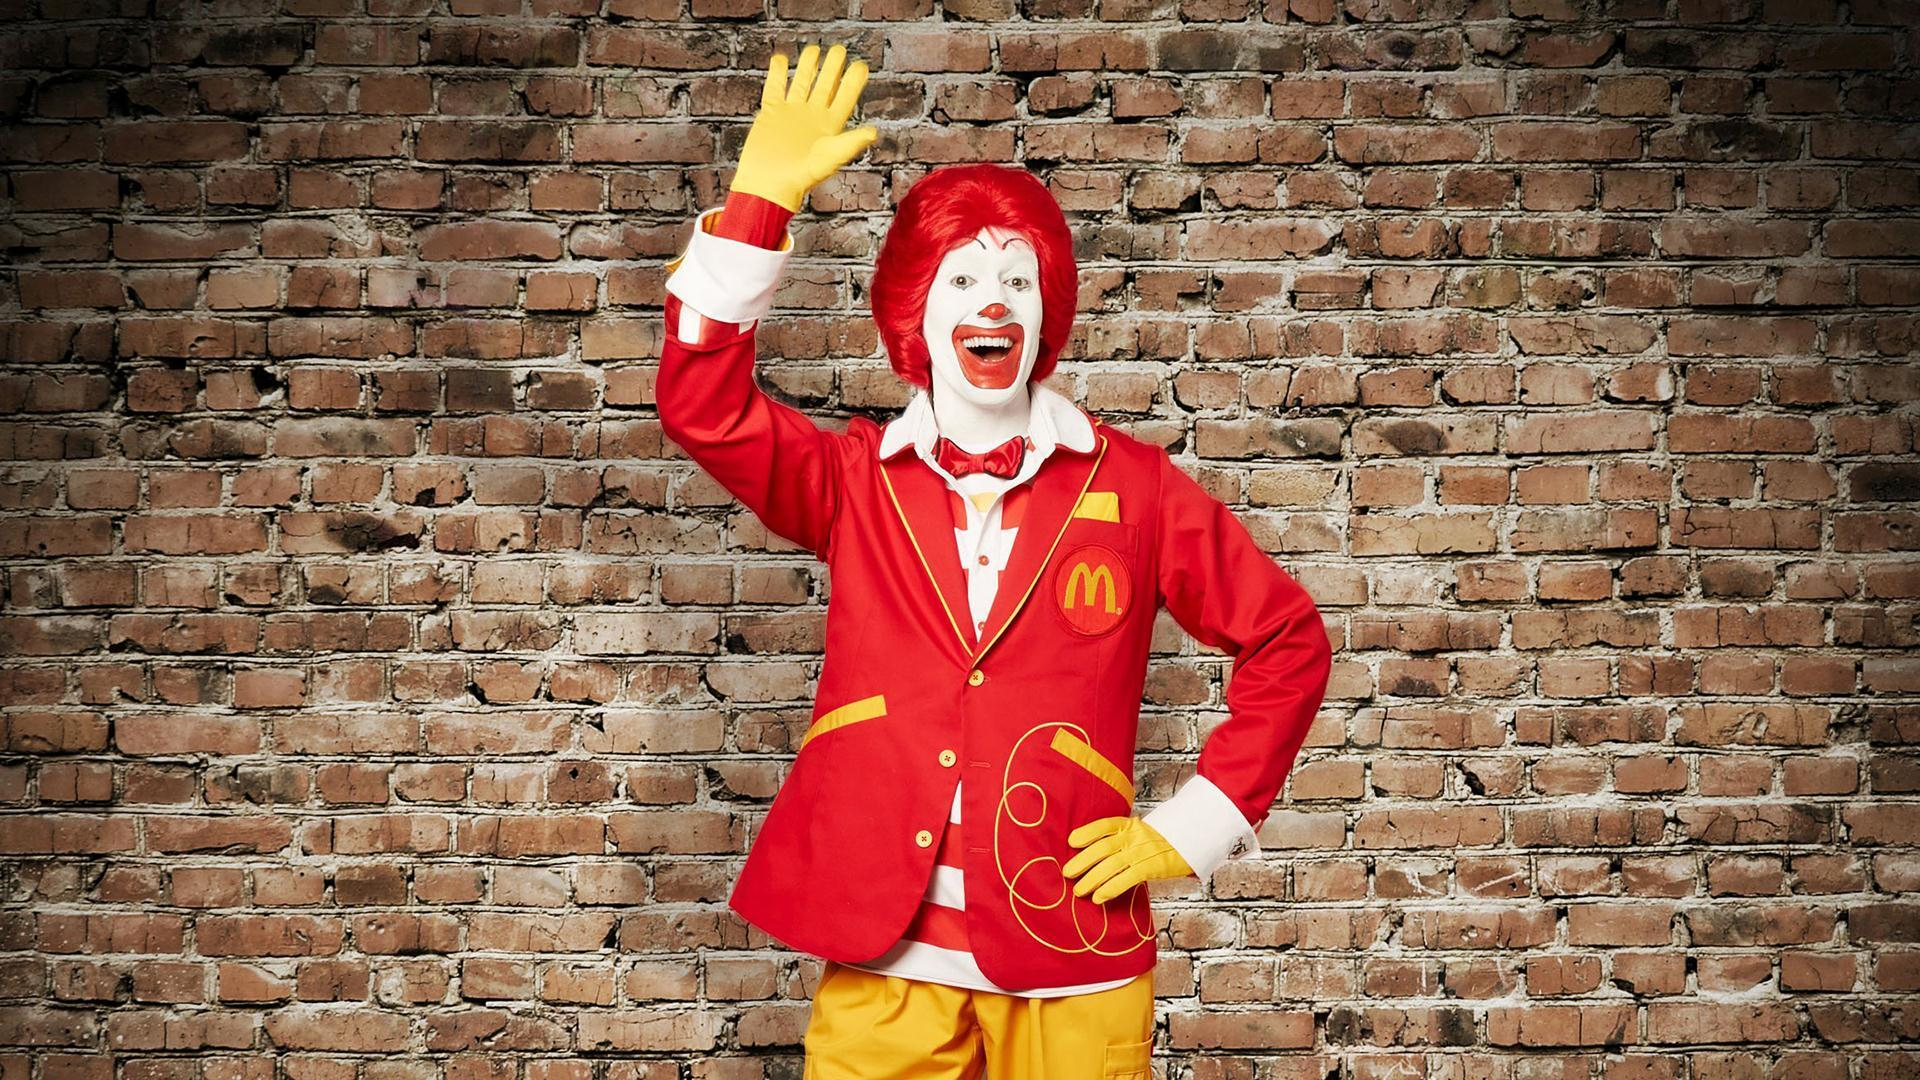 Ronald Mcdonald actors need to sign a waiver